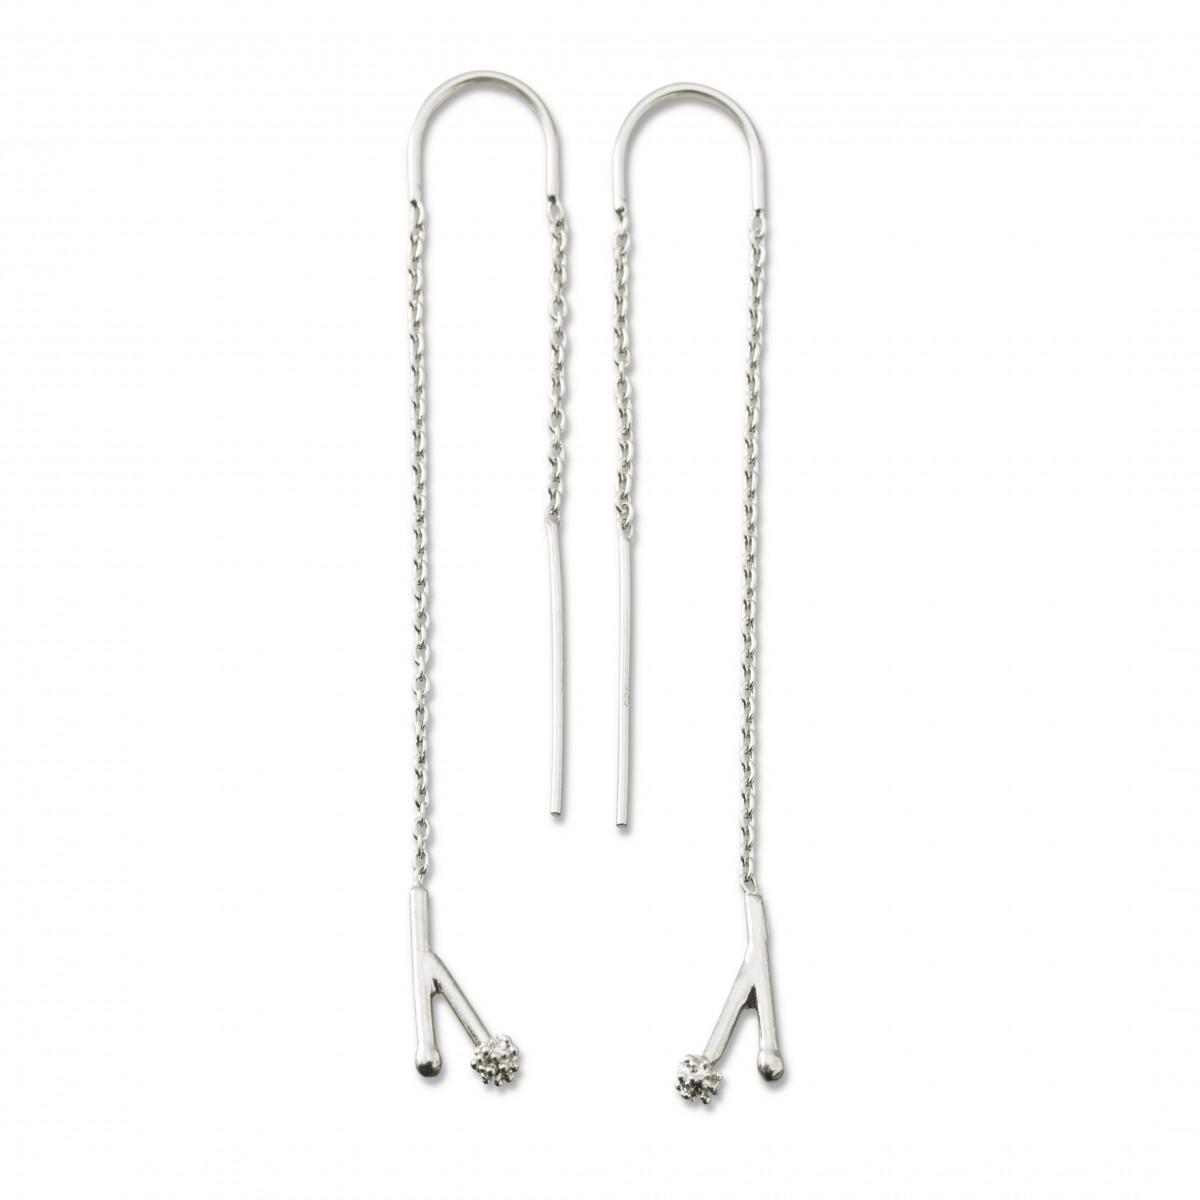 Twig Hanger